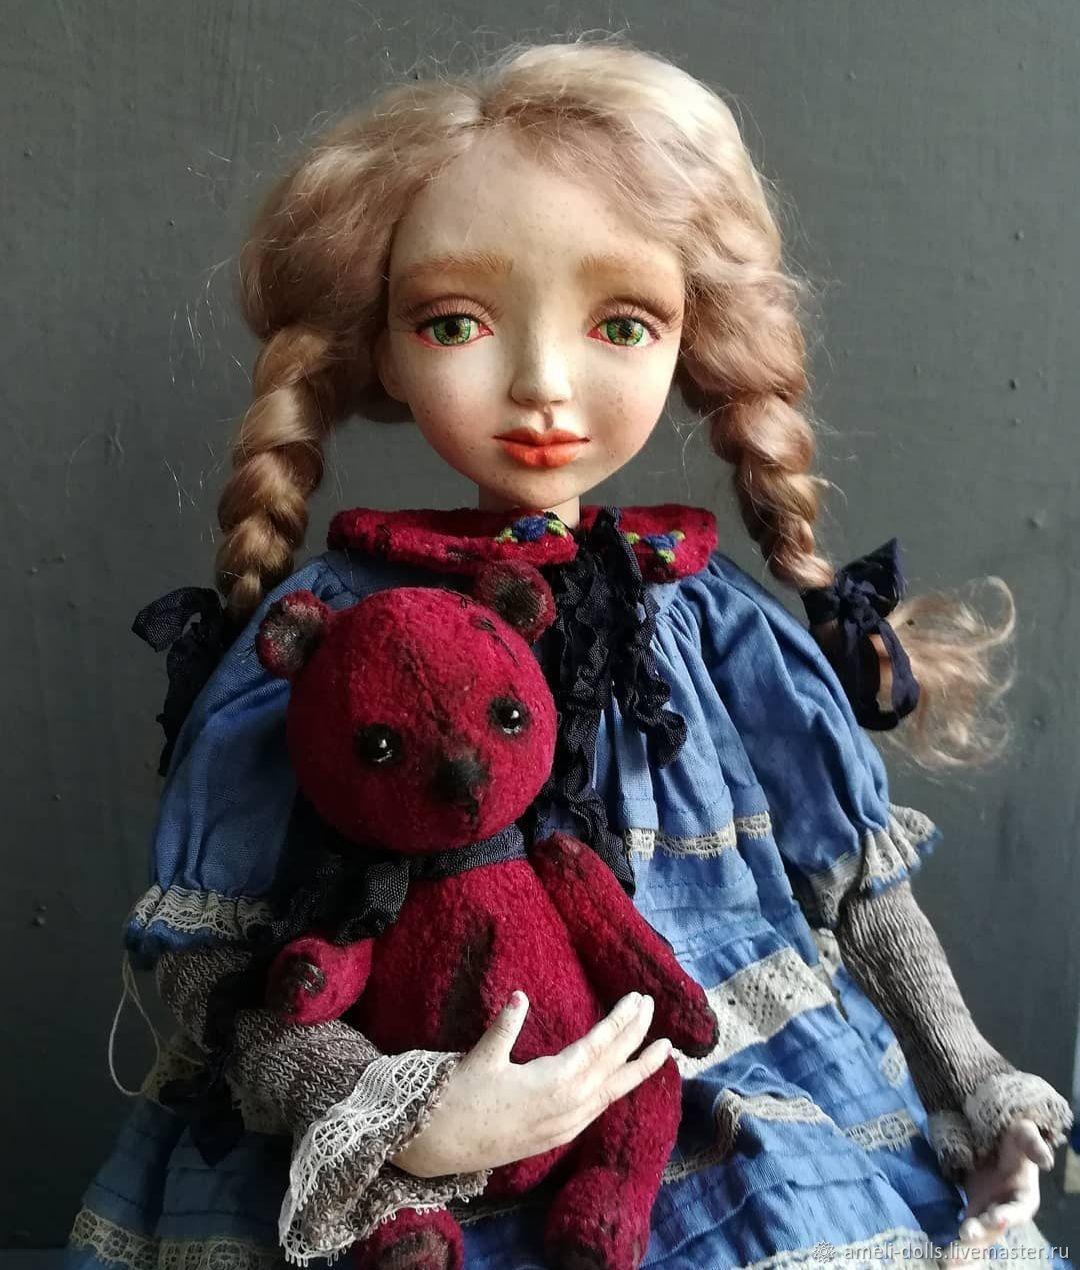 Наташа, Будуарная кукла, Томск,  Фото №1